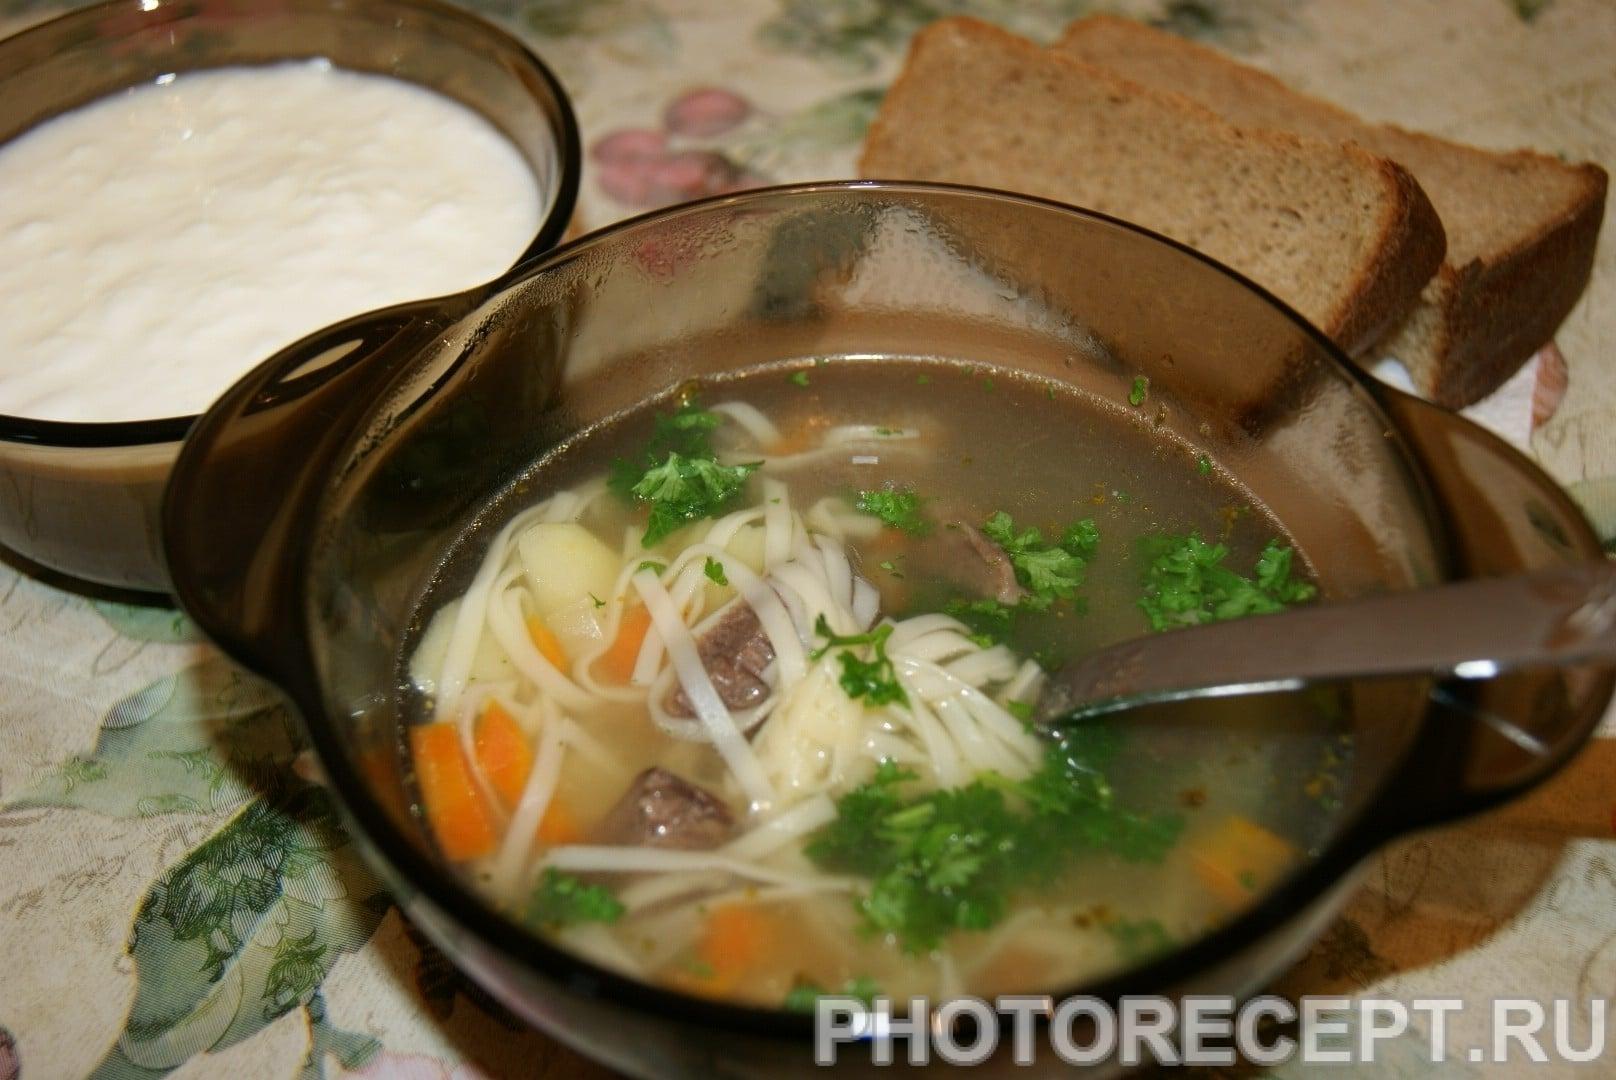 Домашняя лапша суп пошаговый рецепт с фото